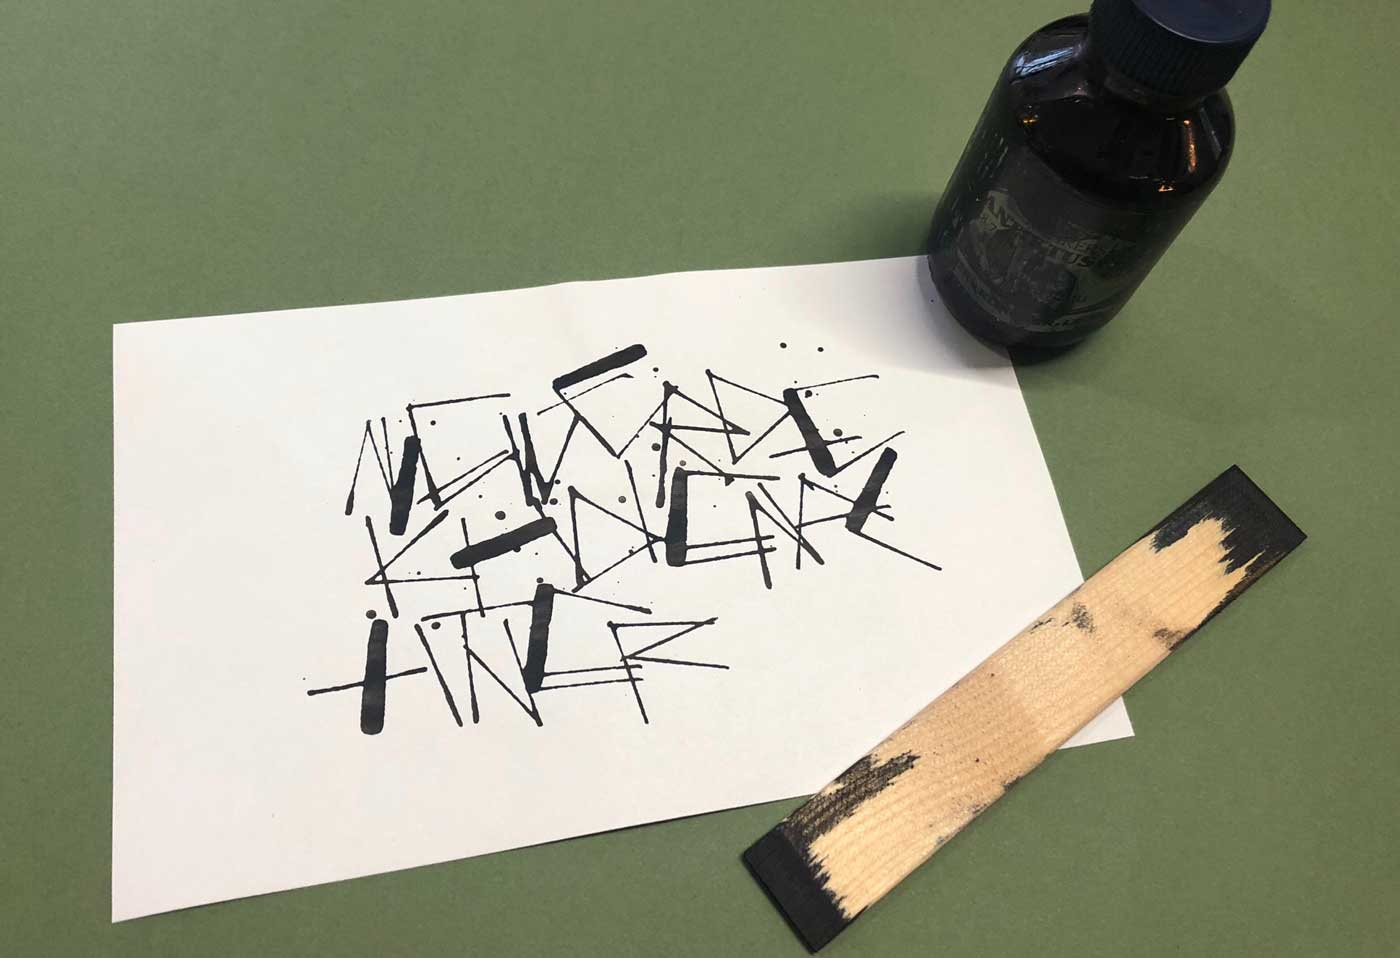 Kreatives Schreiben Schriftschatz Duesseldorf Flingern